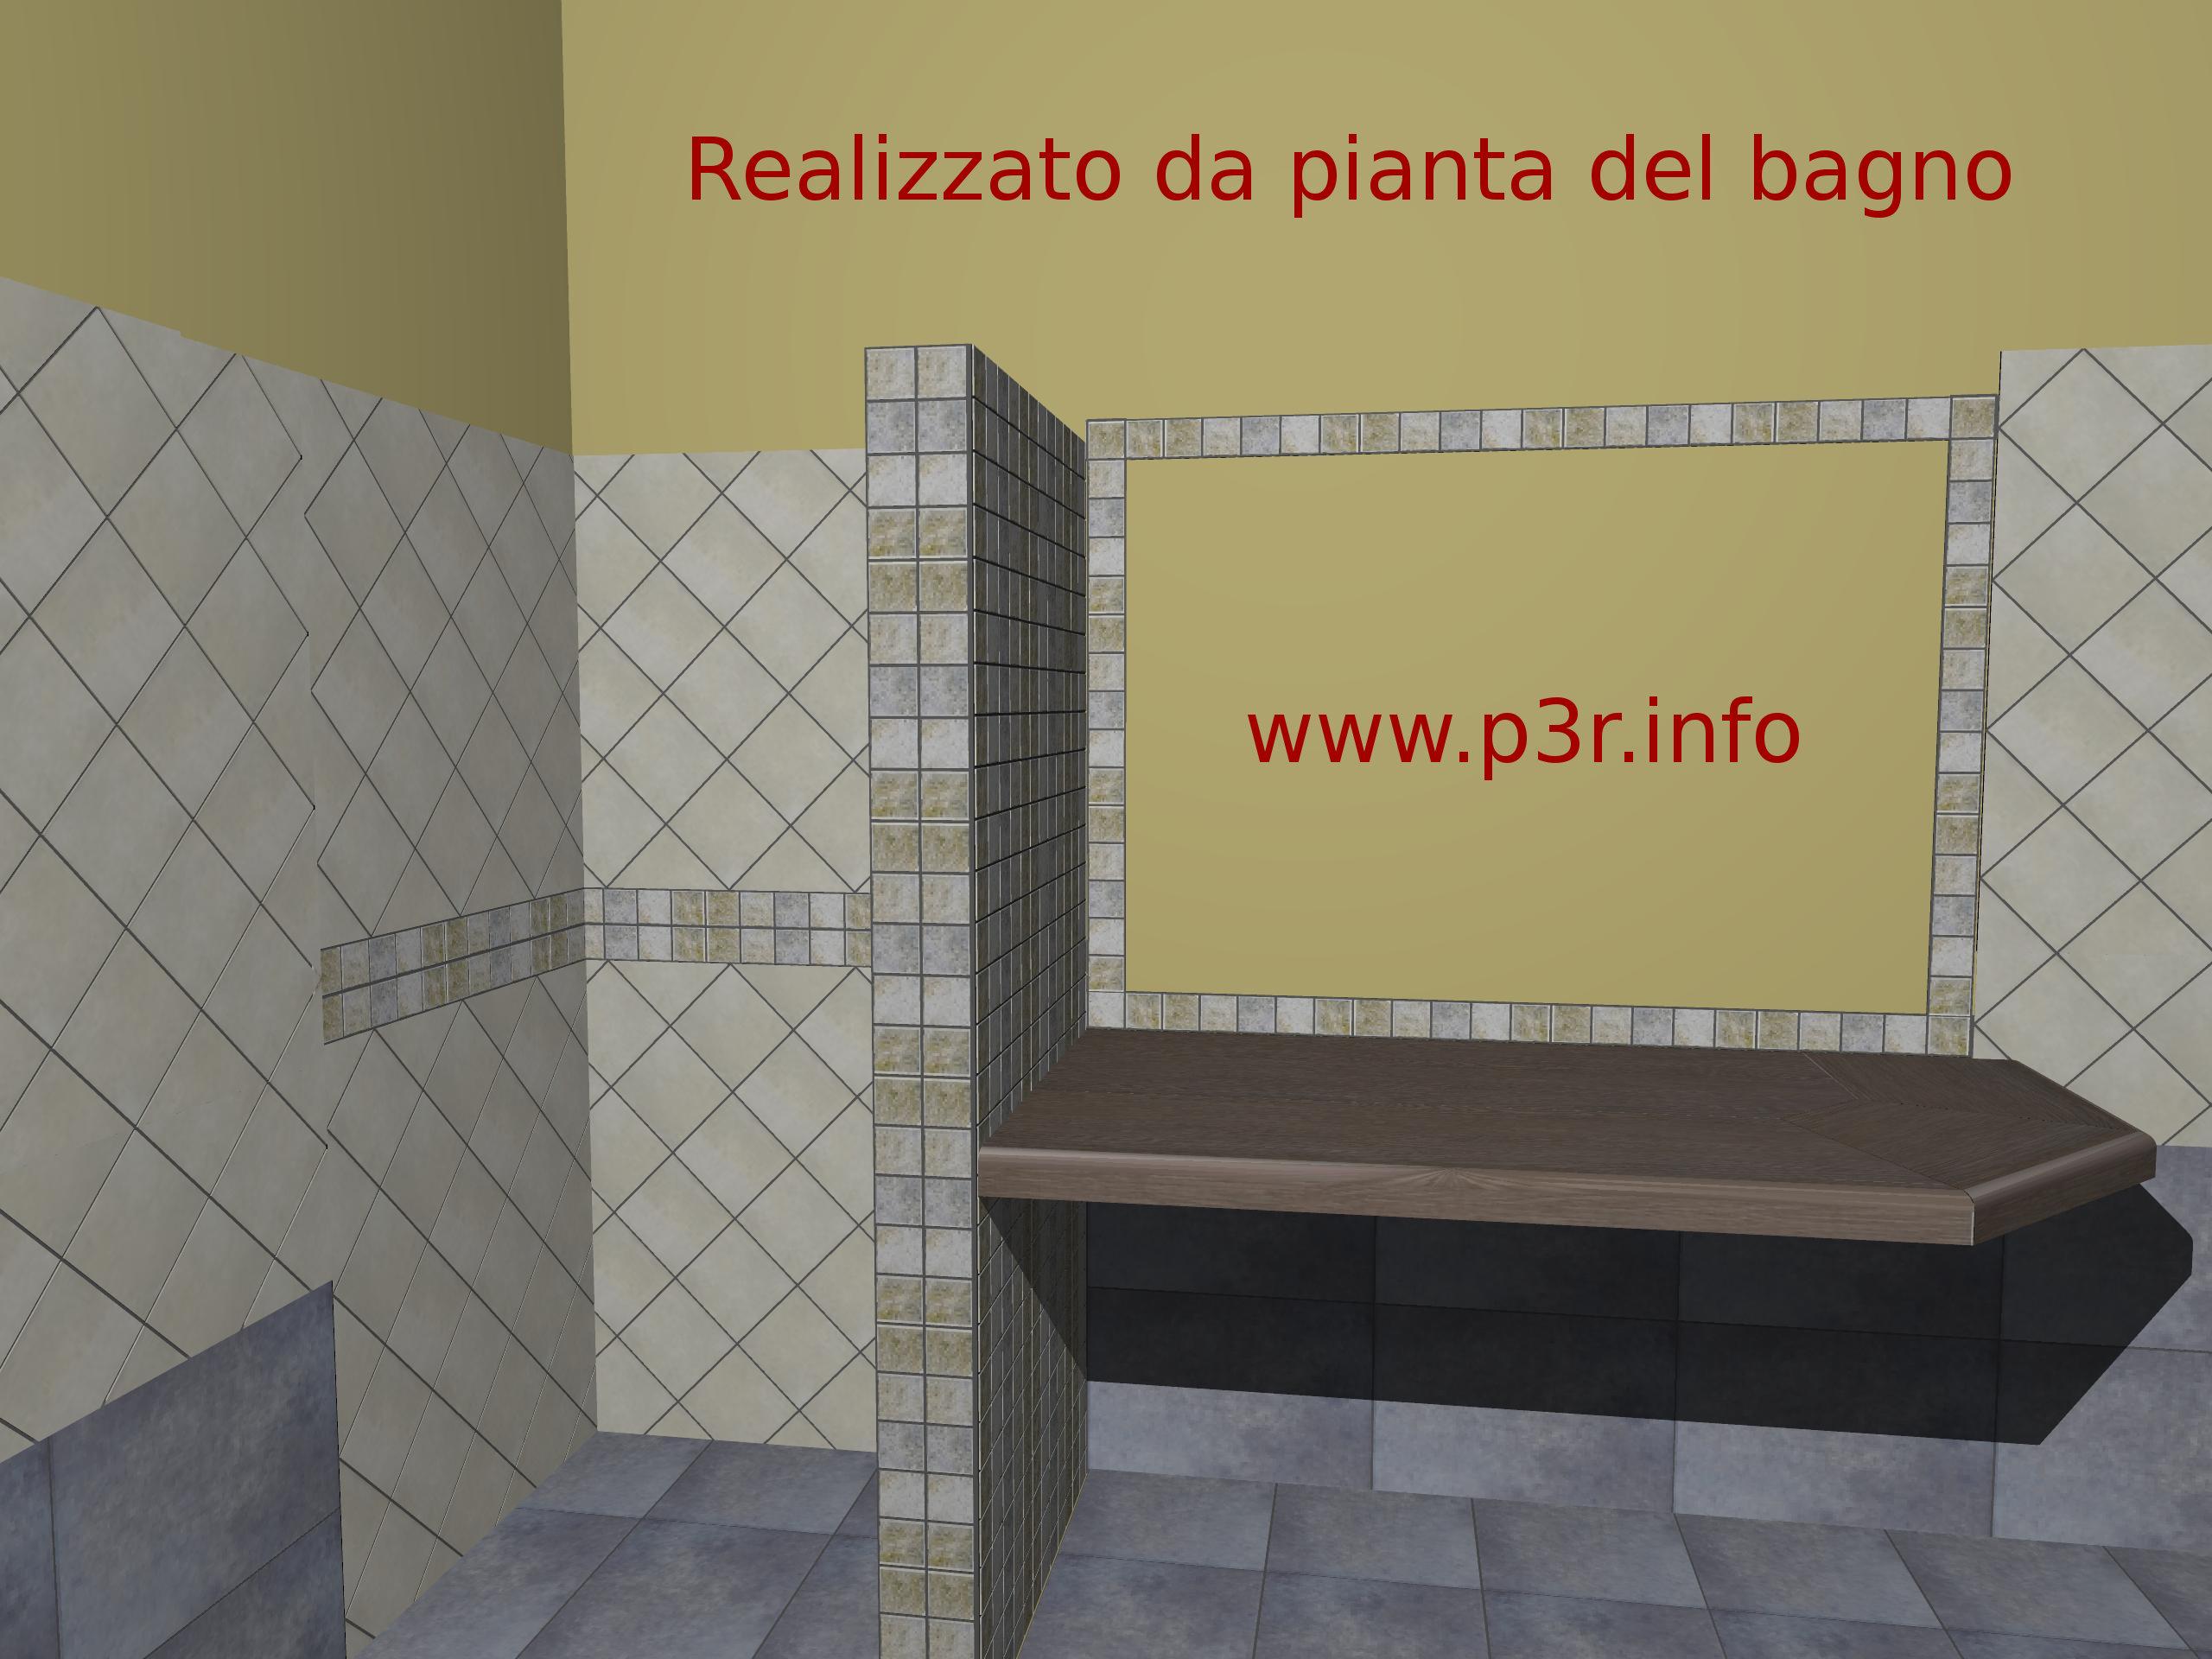 home [www.p3r.info]